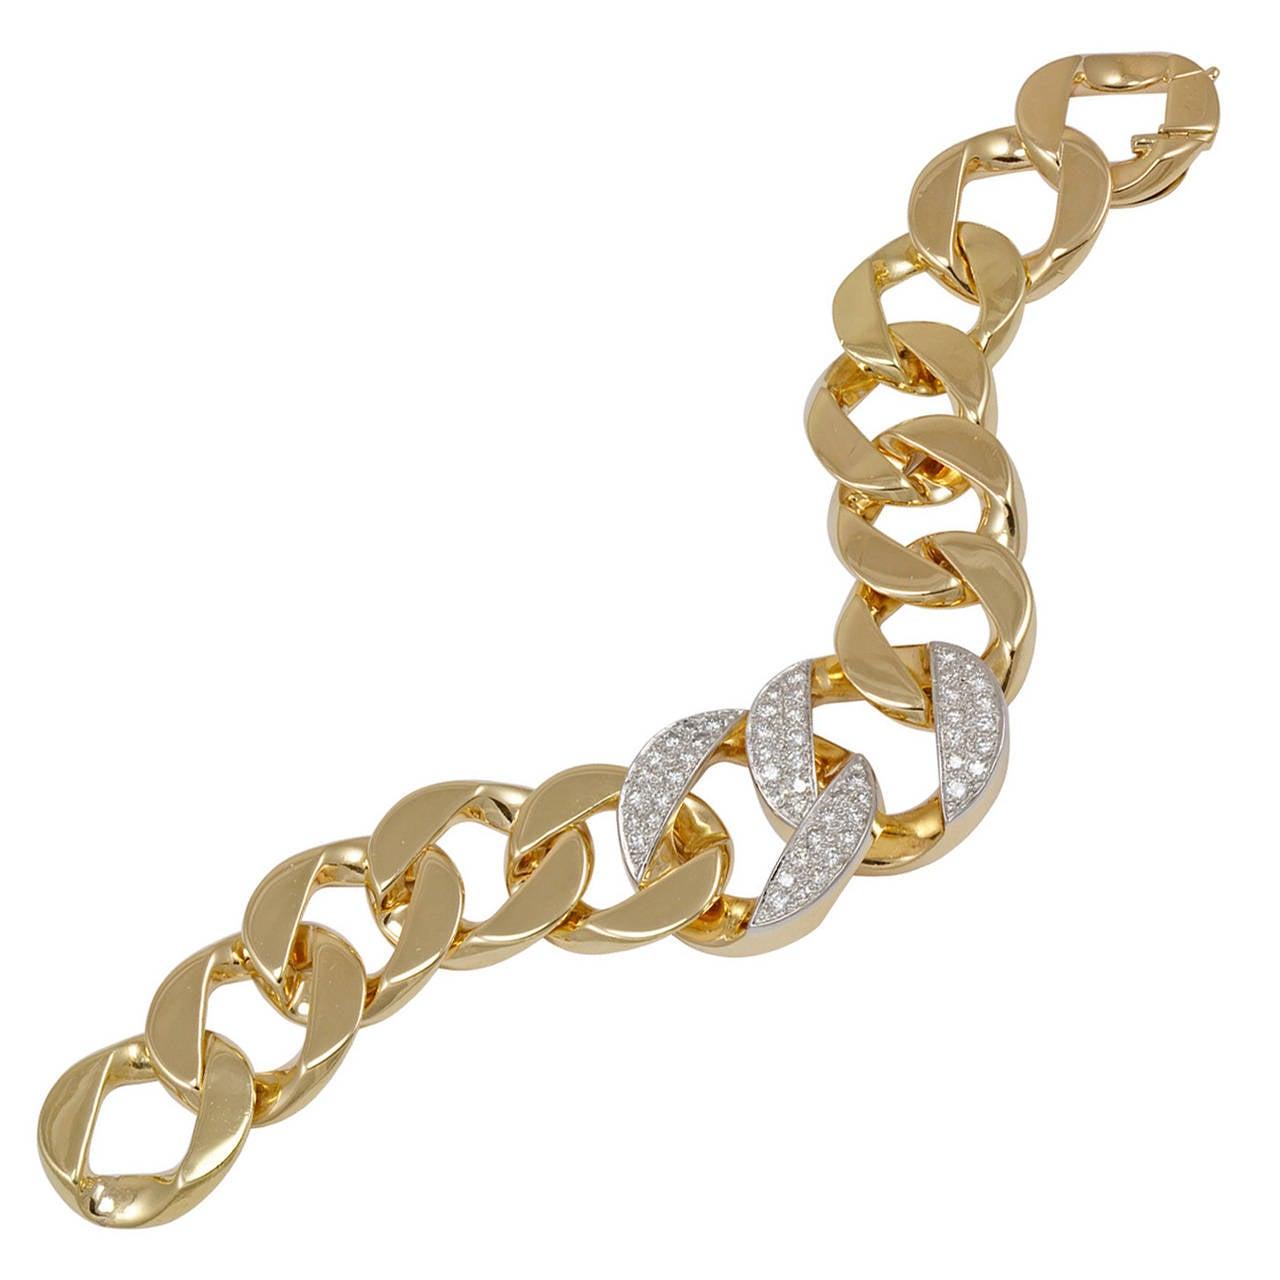 1940s Cartier Fabulous Diamond Gold Link Bracelet